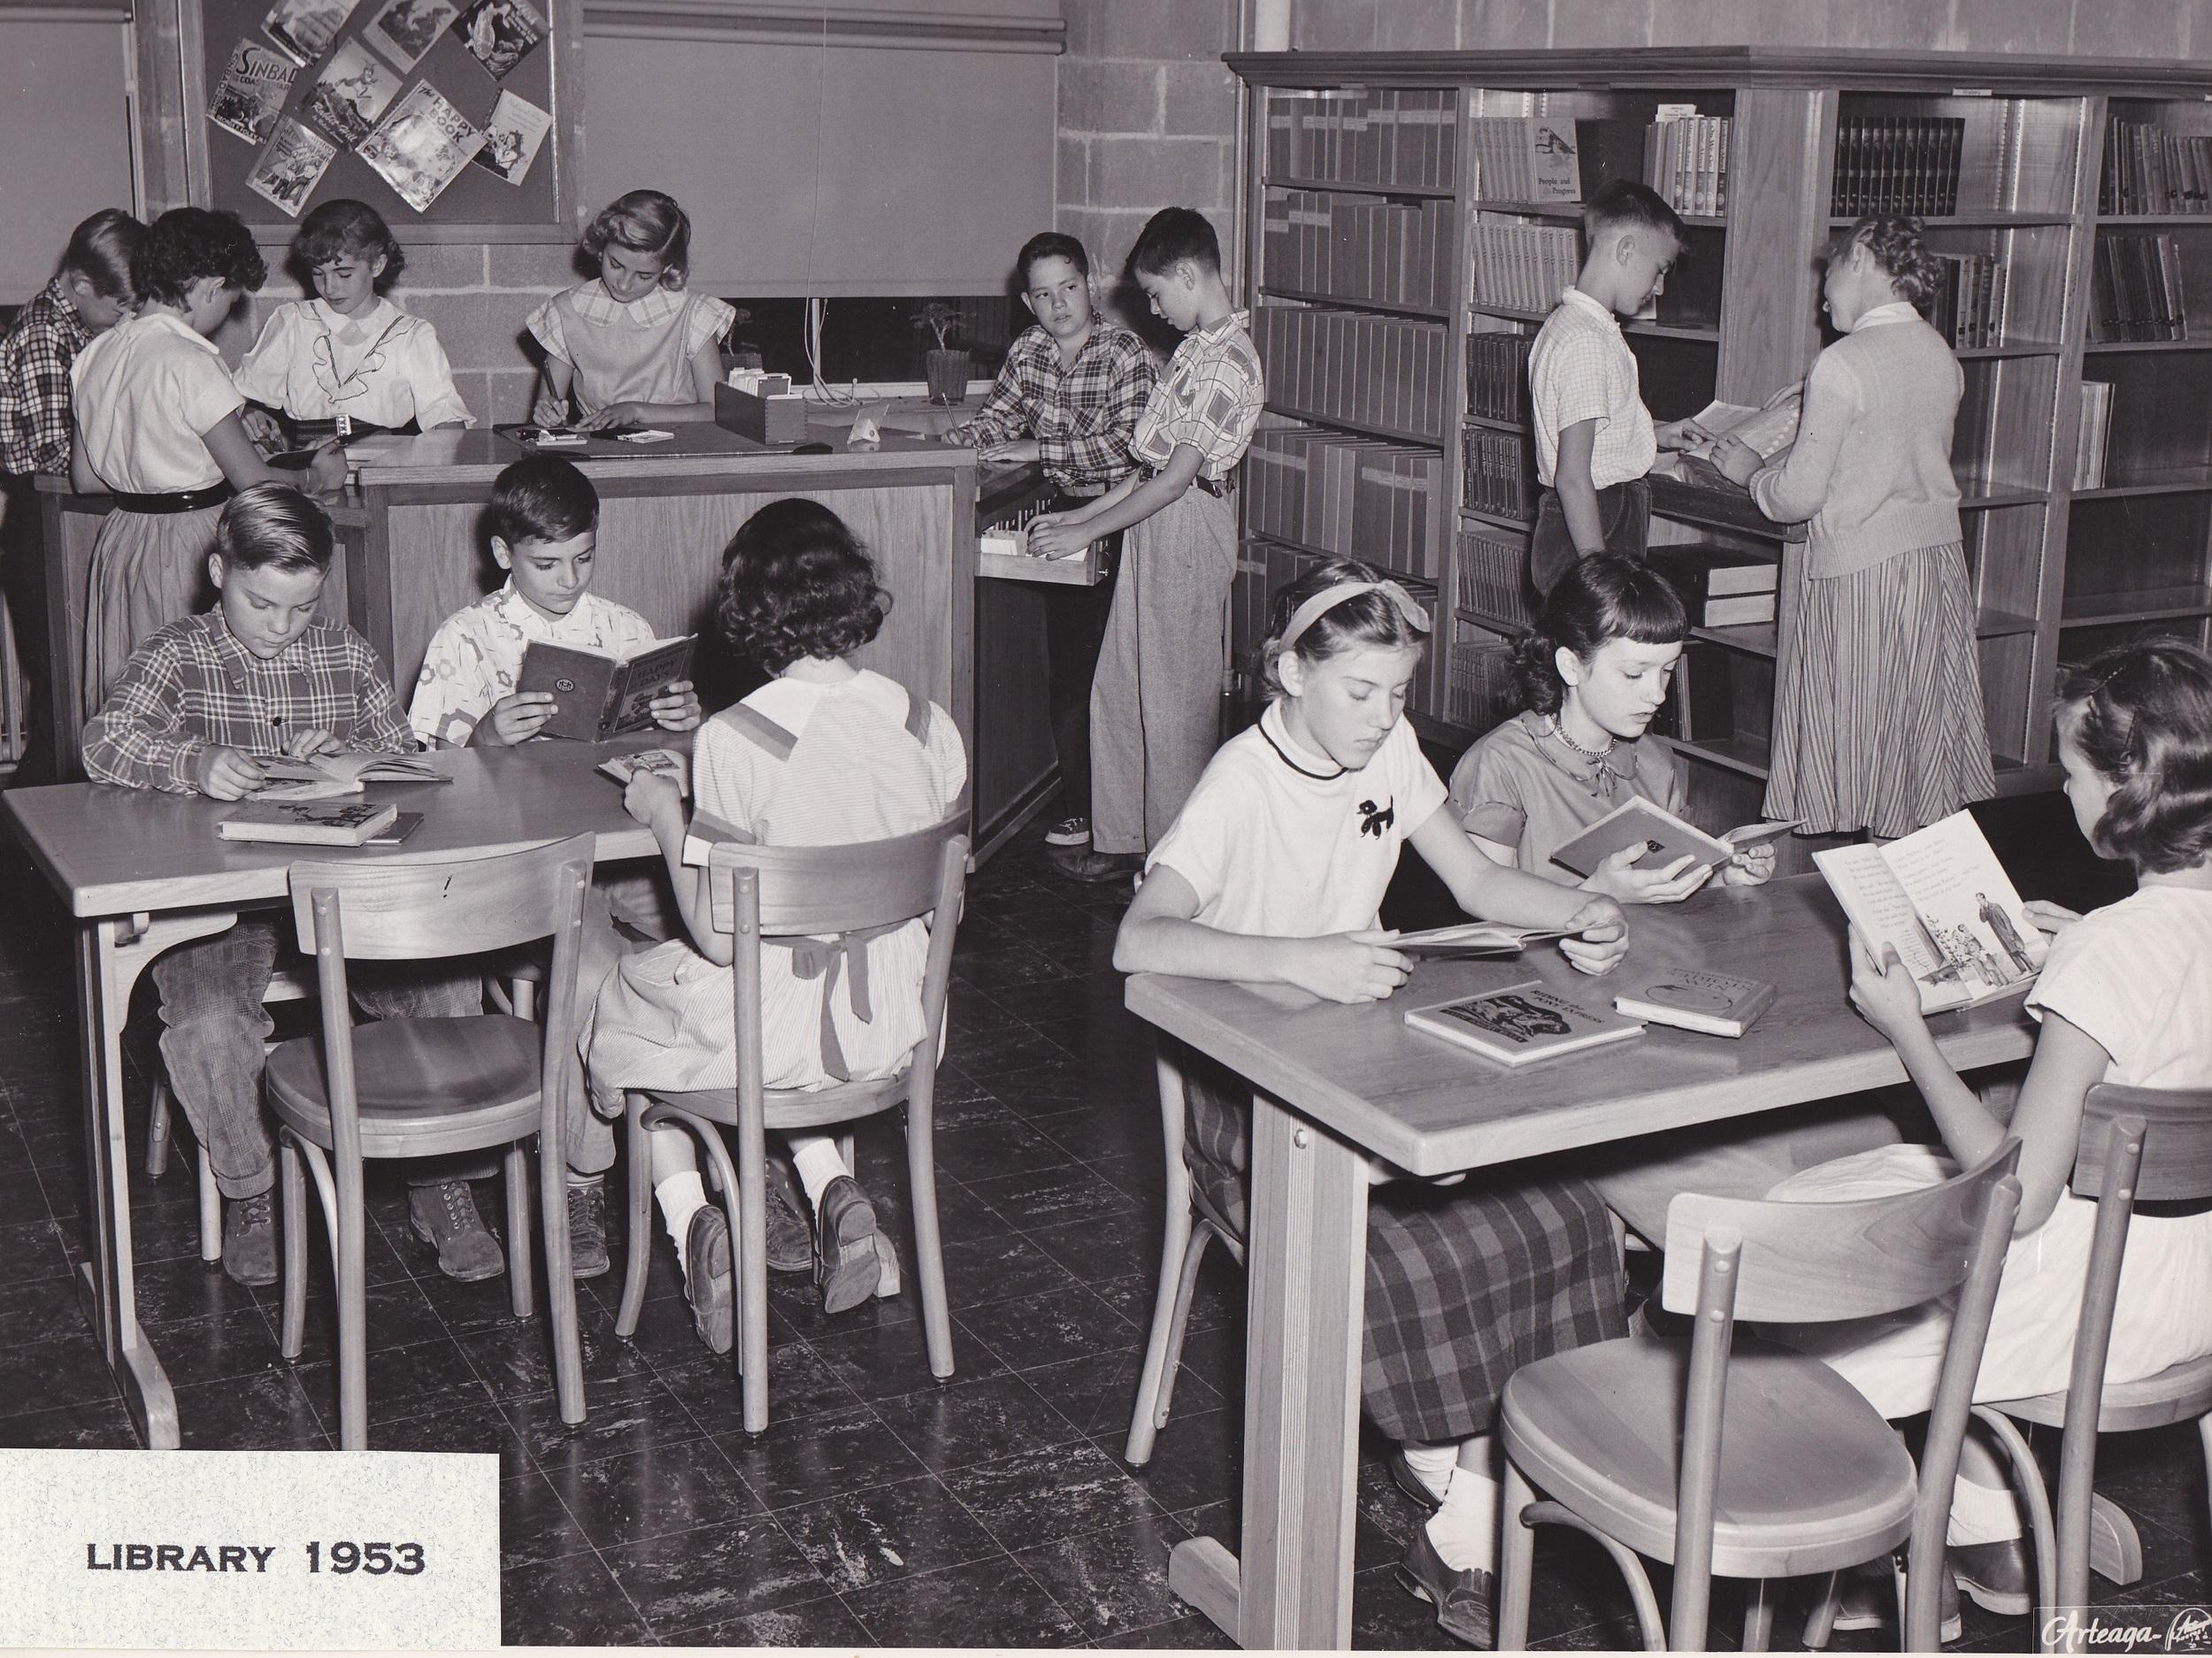 7-Library 1953.jpg